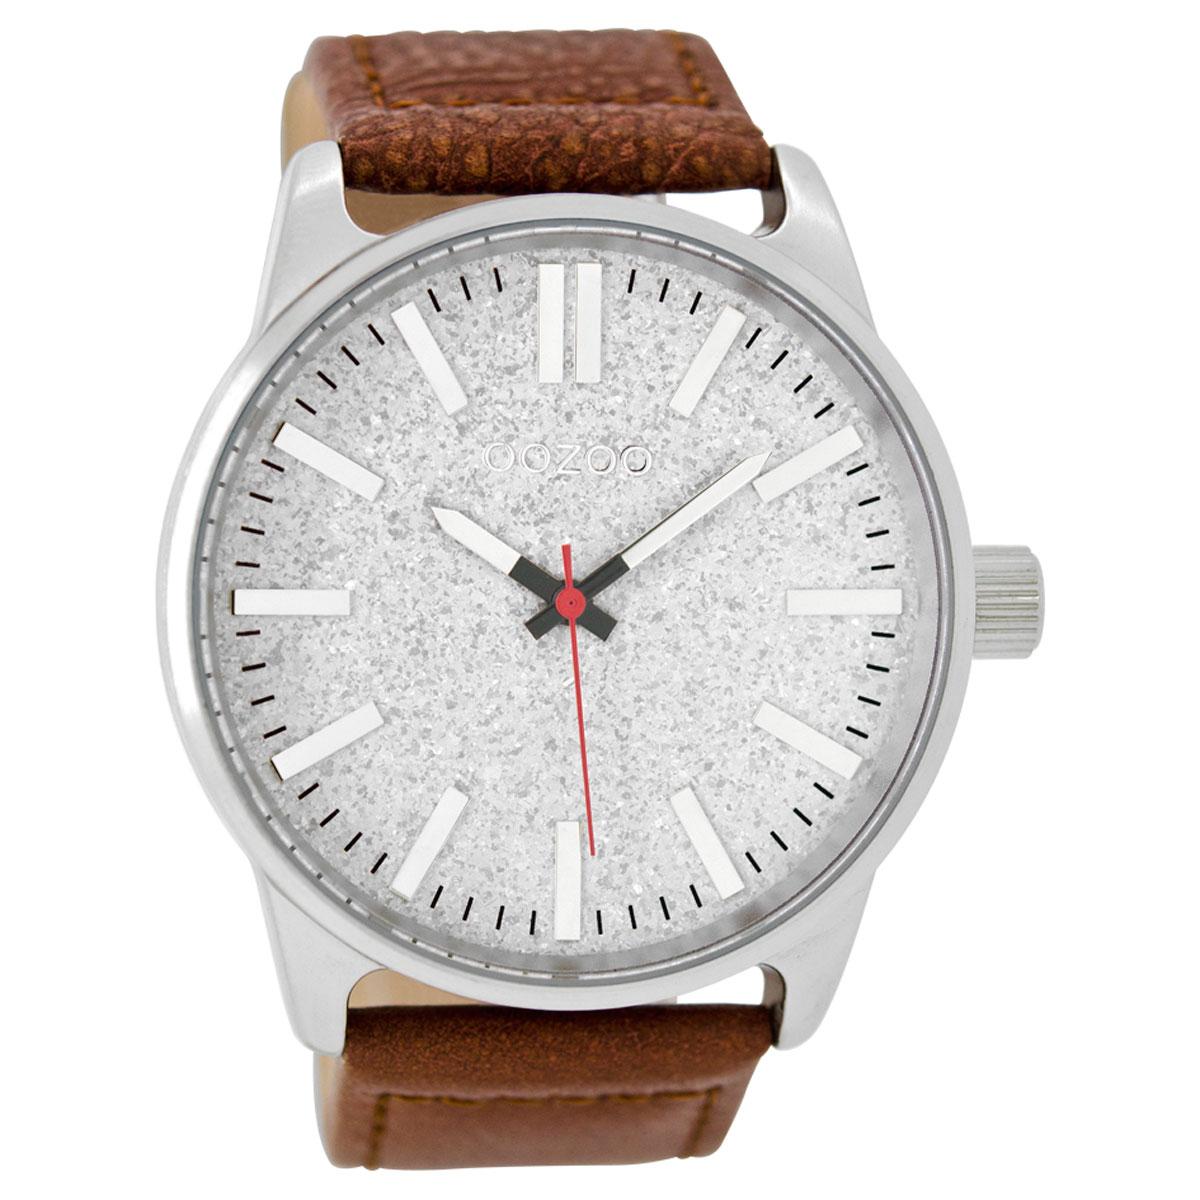 OOZOO Timepieces C9060 ανδρικό ρολόι XL με ασημί μεταλλική κάσα και καφέ  δερμάτινο λουράκι 3226d893199